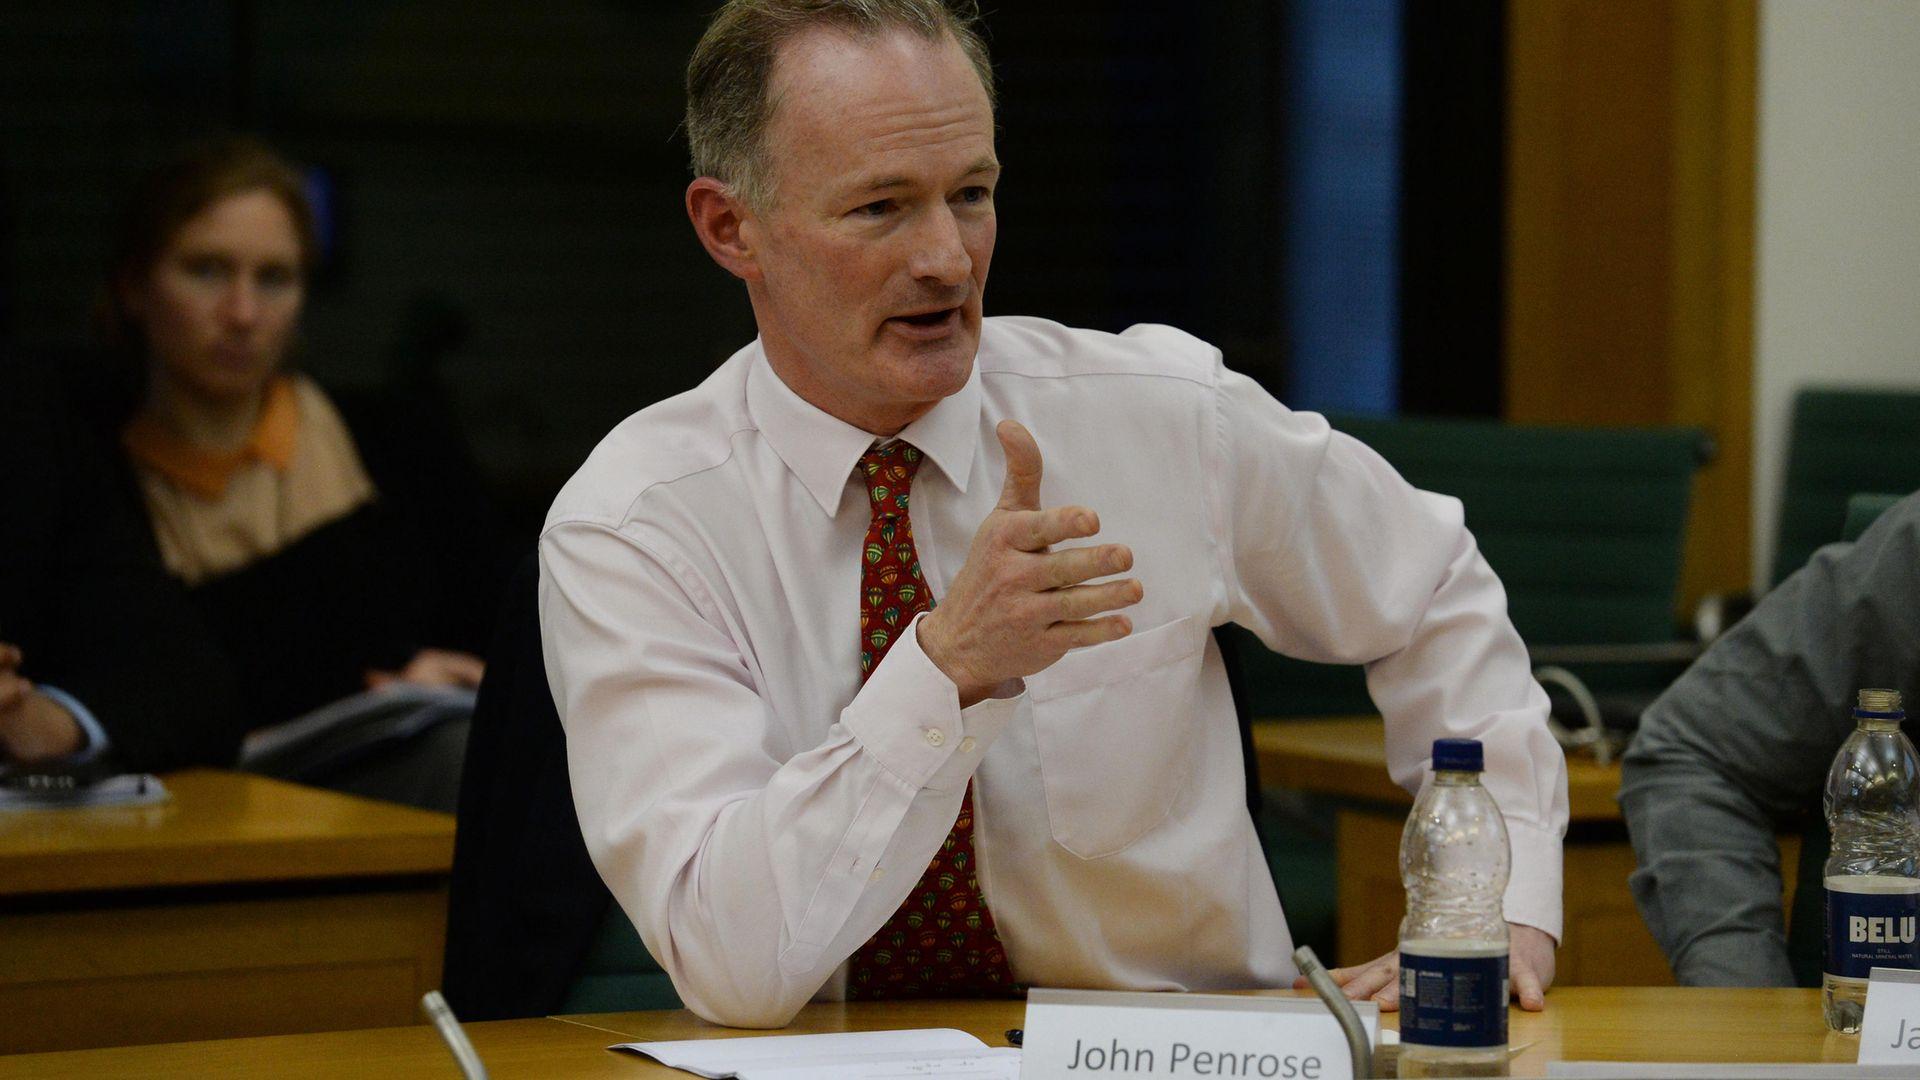 John Penrose, MP for Weston-super-Mare - Credit: PA